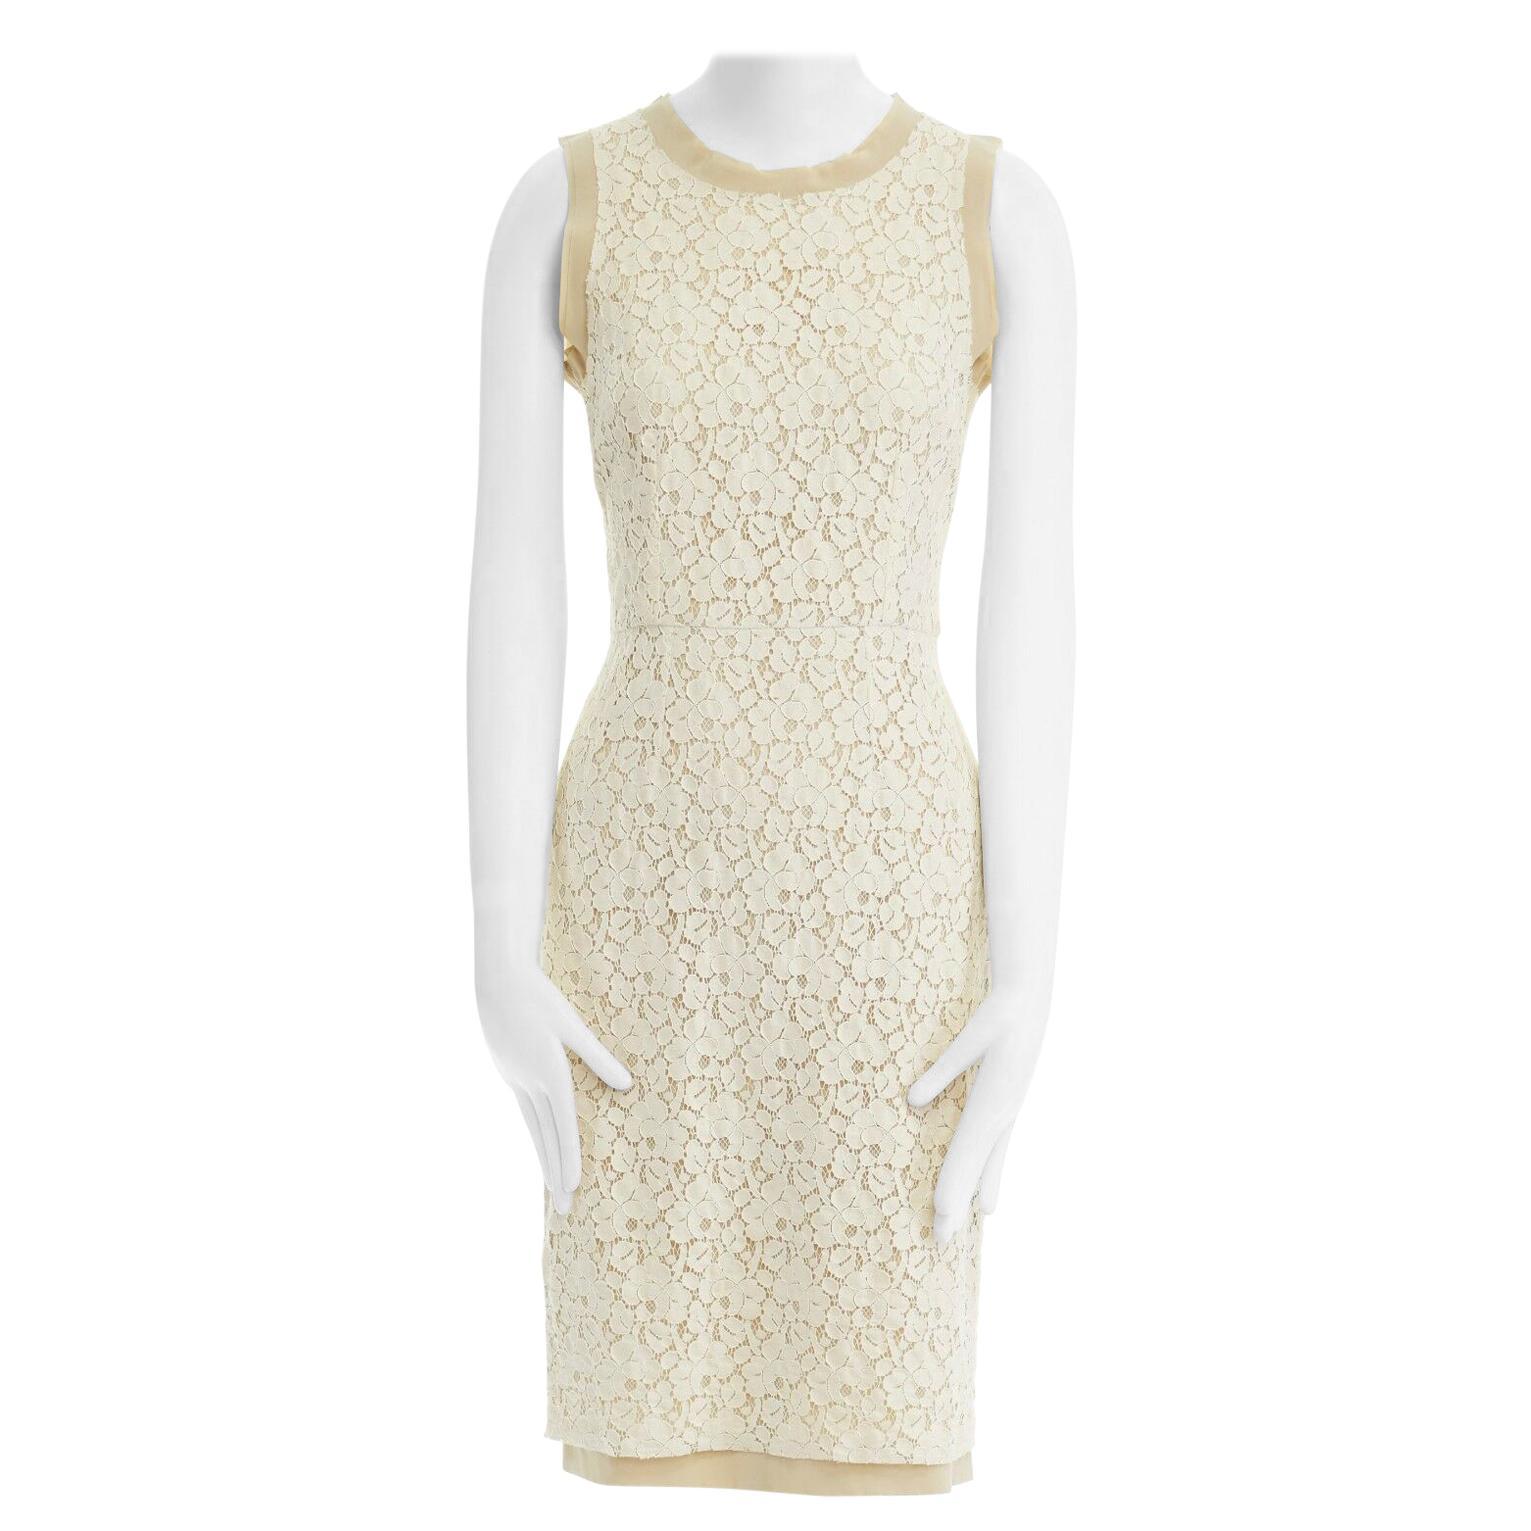 DOLCE GABBANA cream floral lace silk trim sleeveless cocktail dress IT38 US0 XS